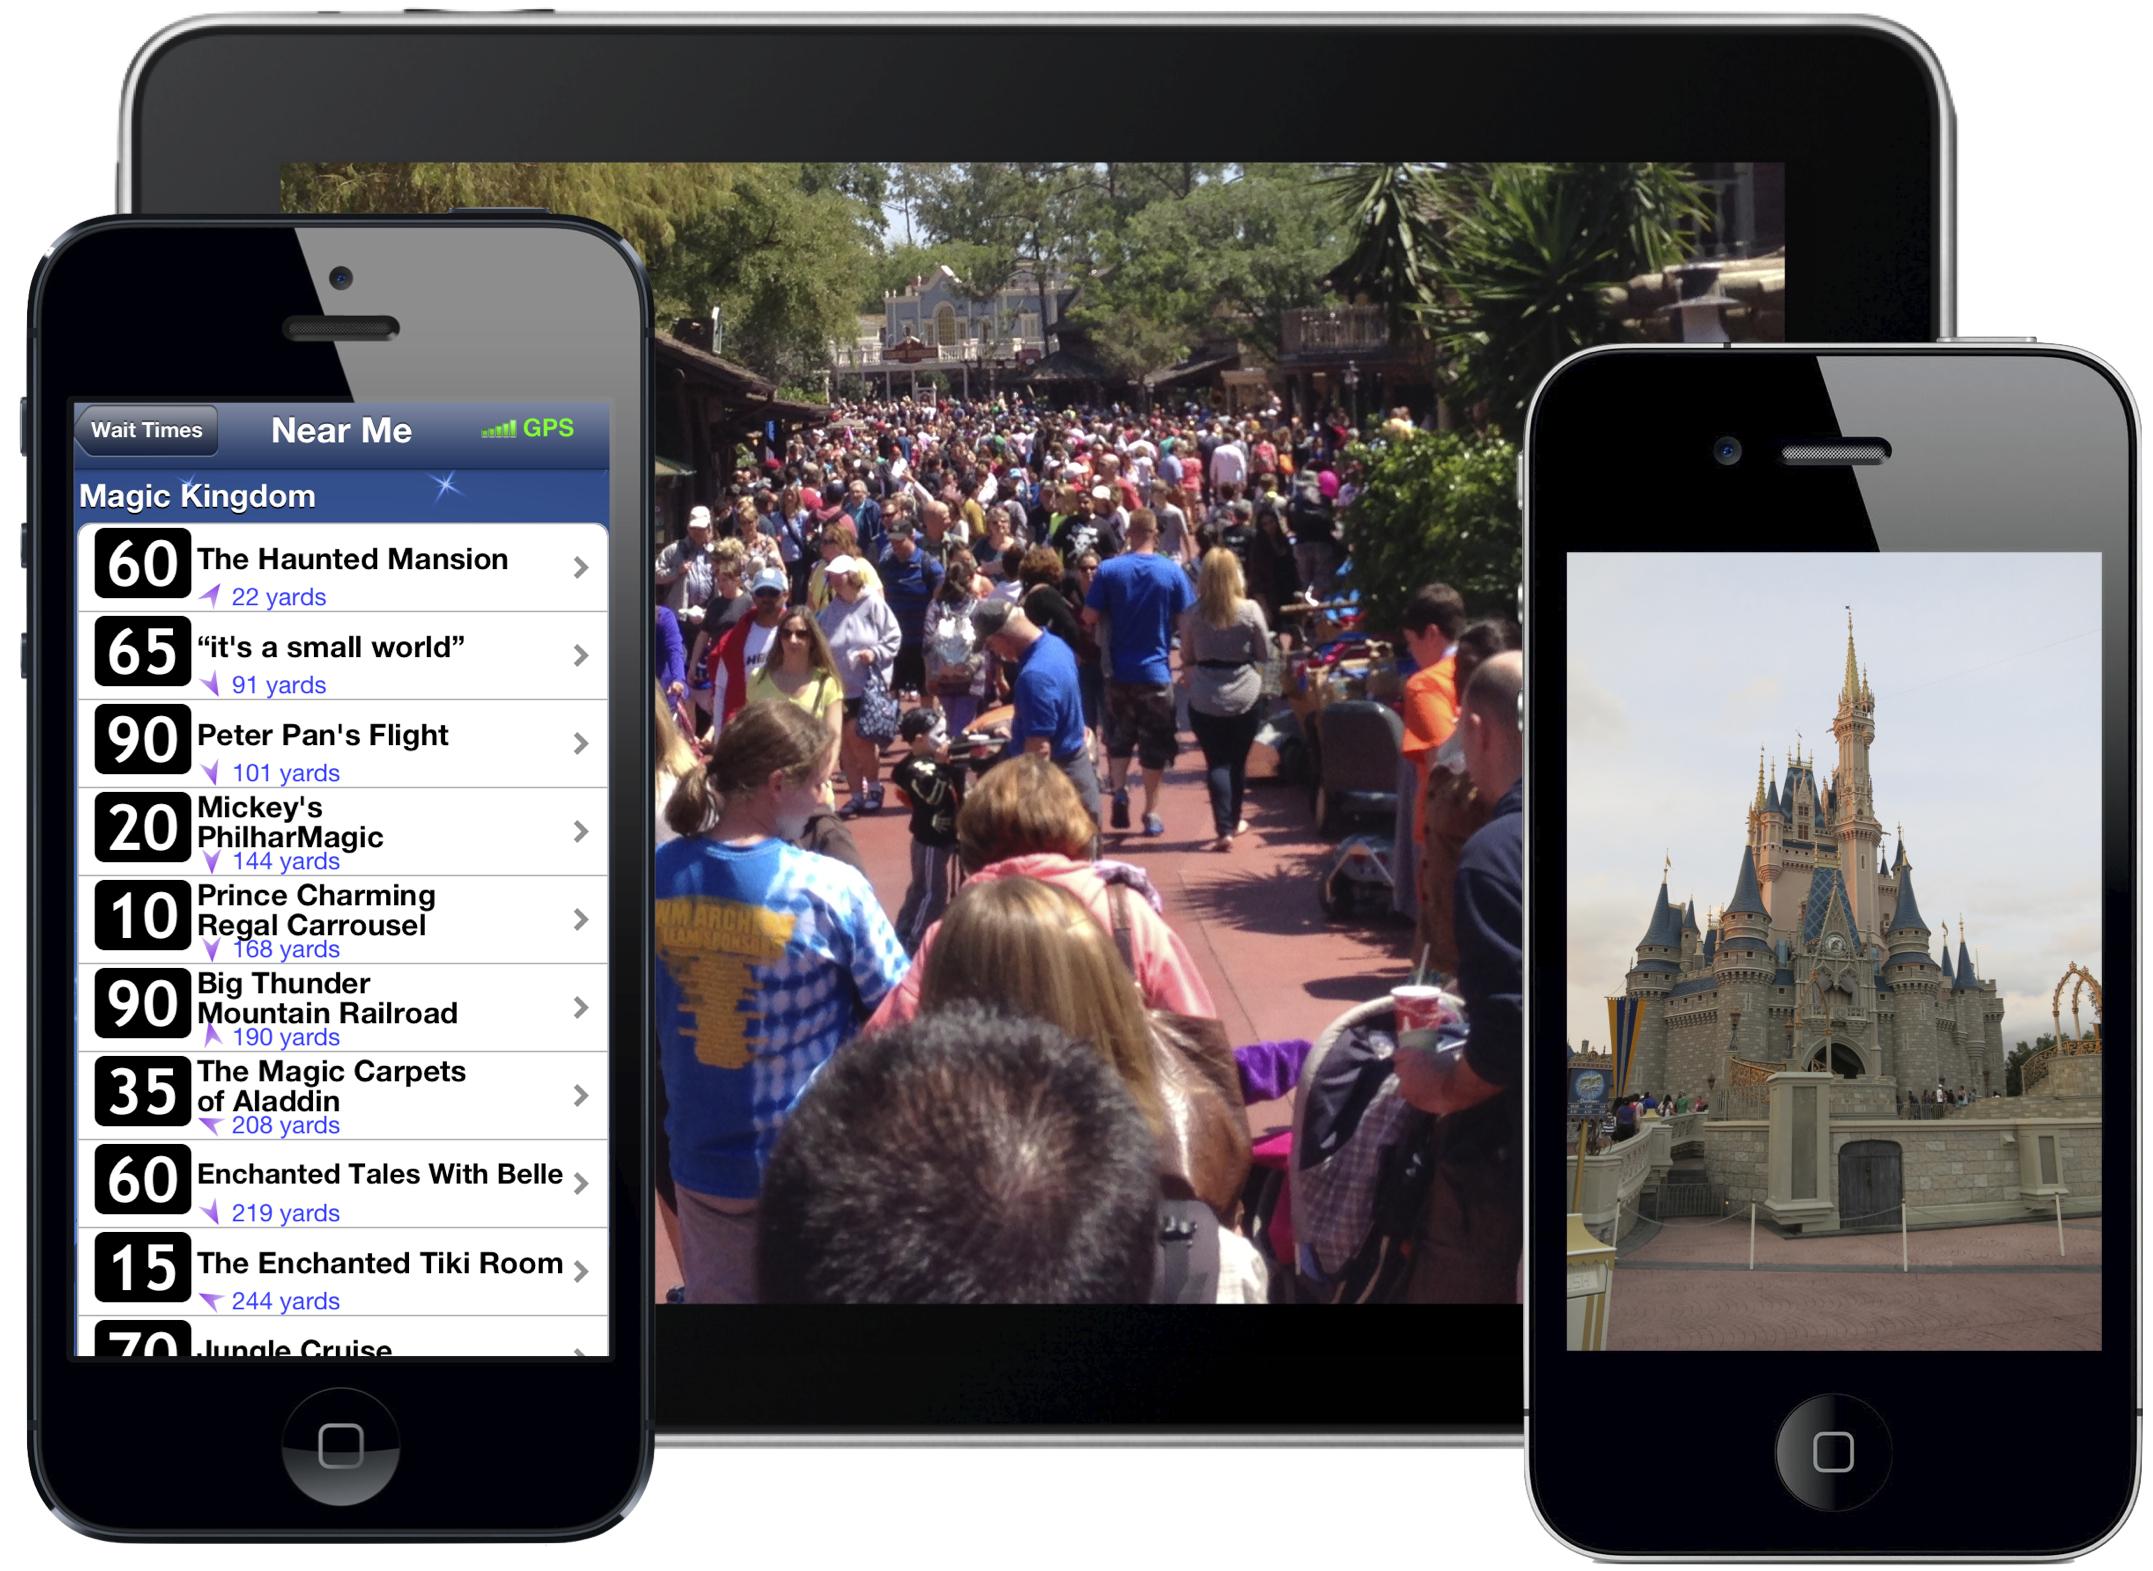 Disney Resort Apps